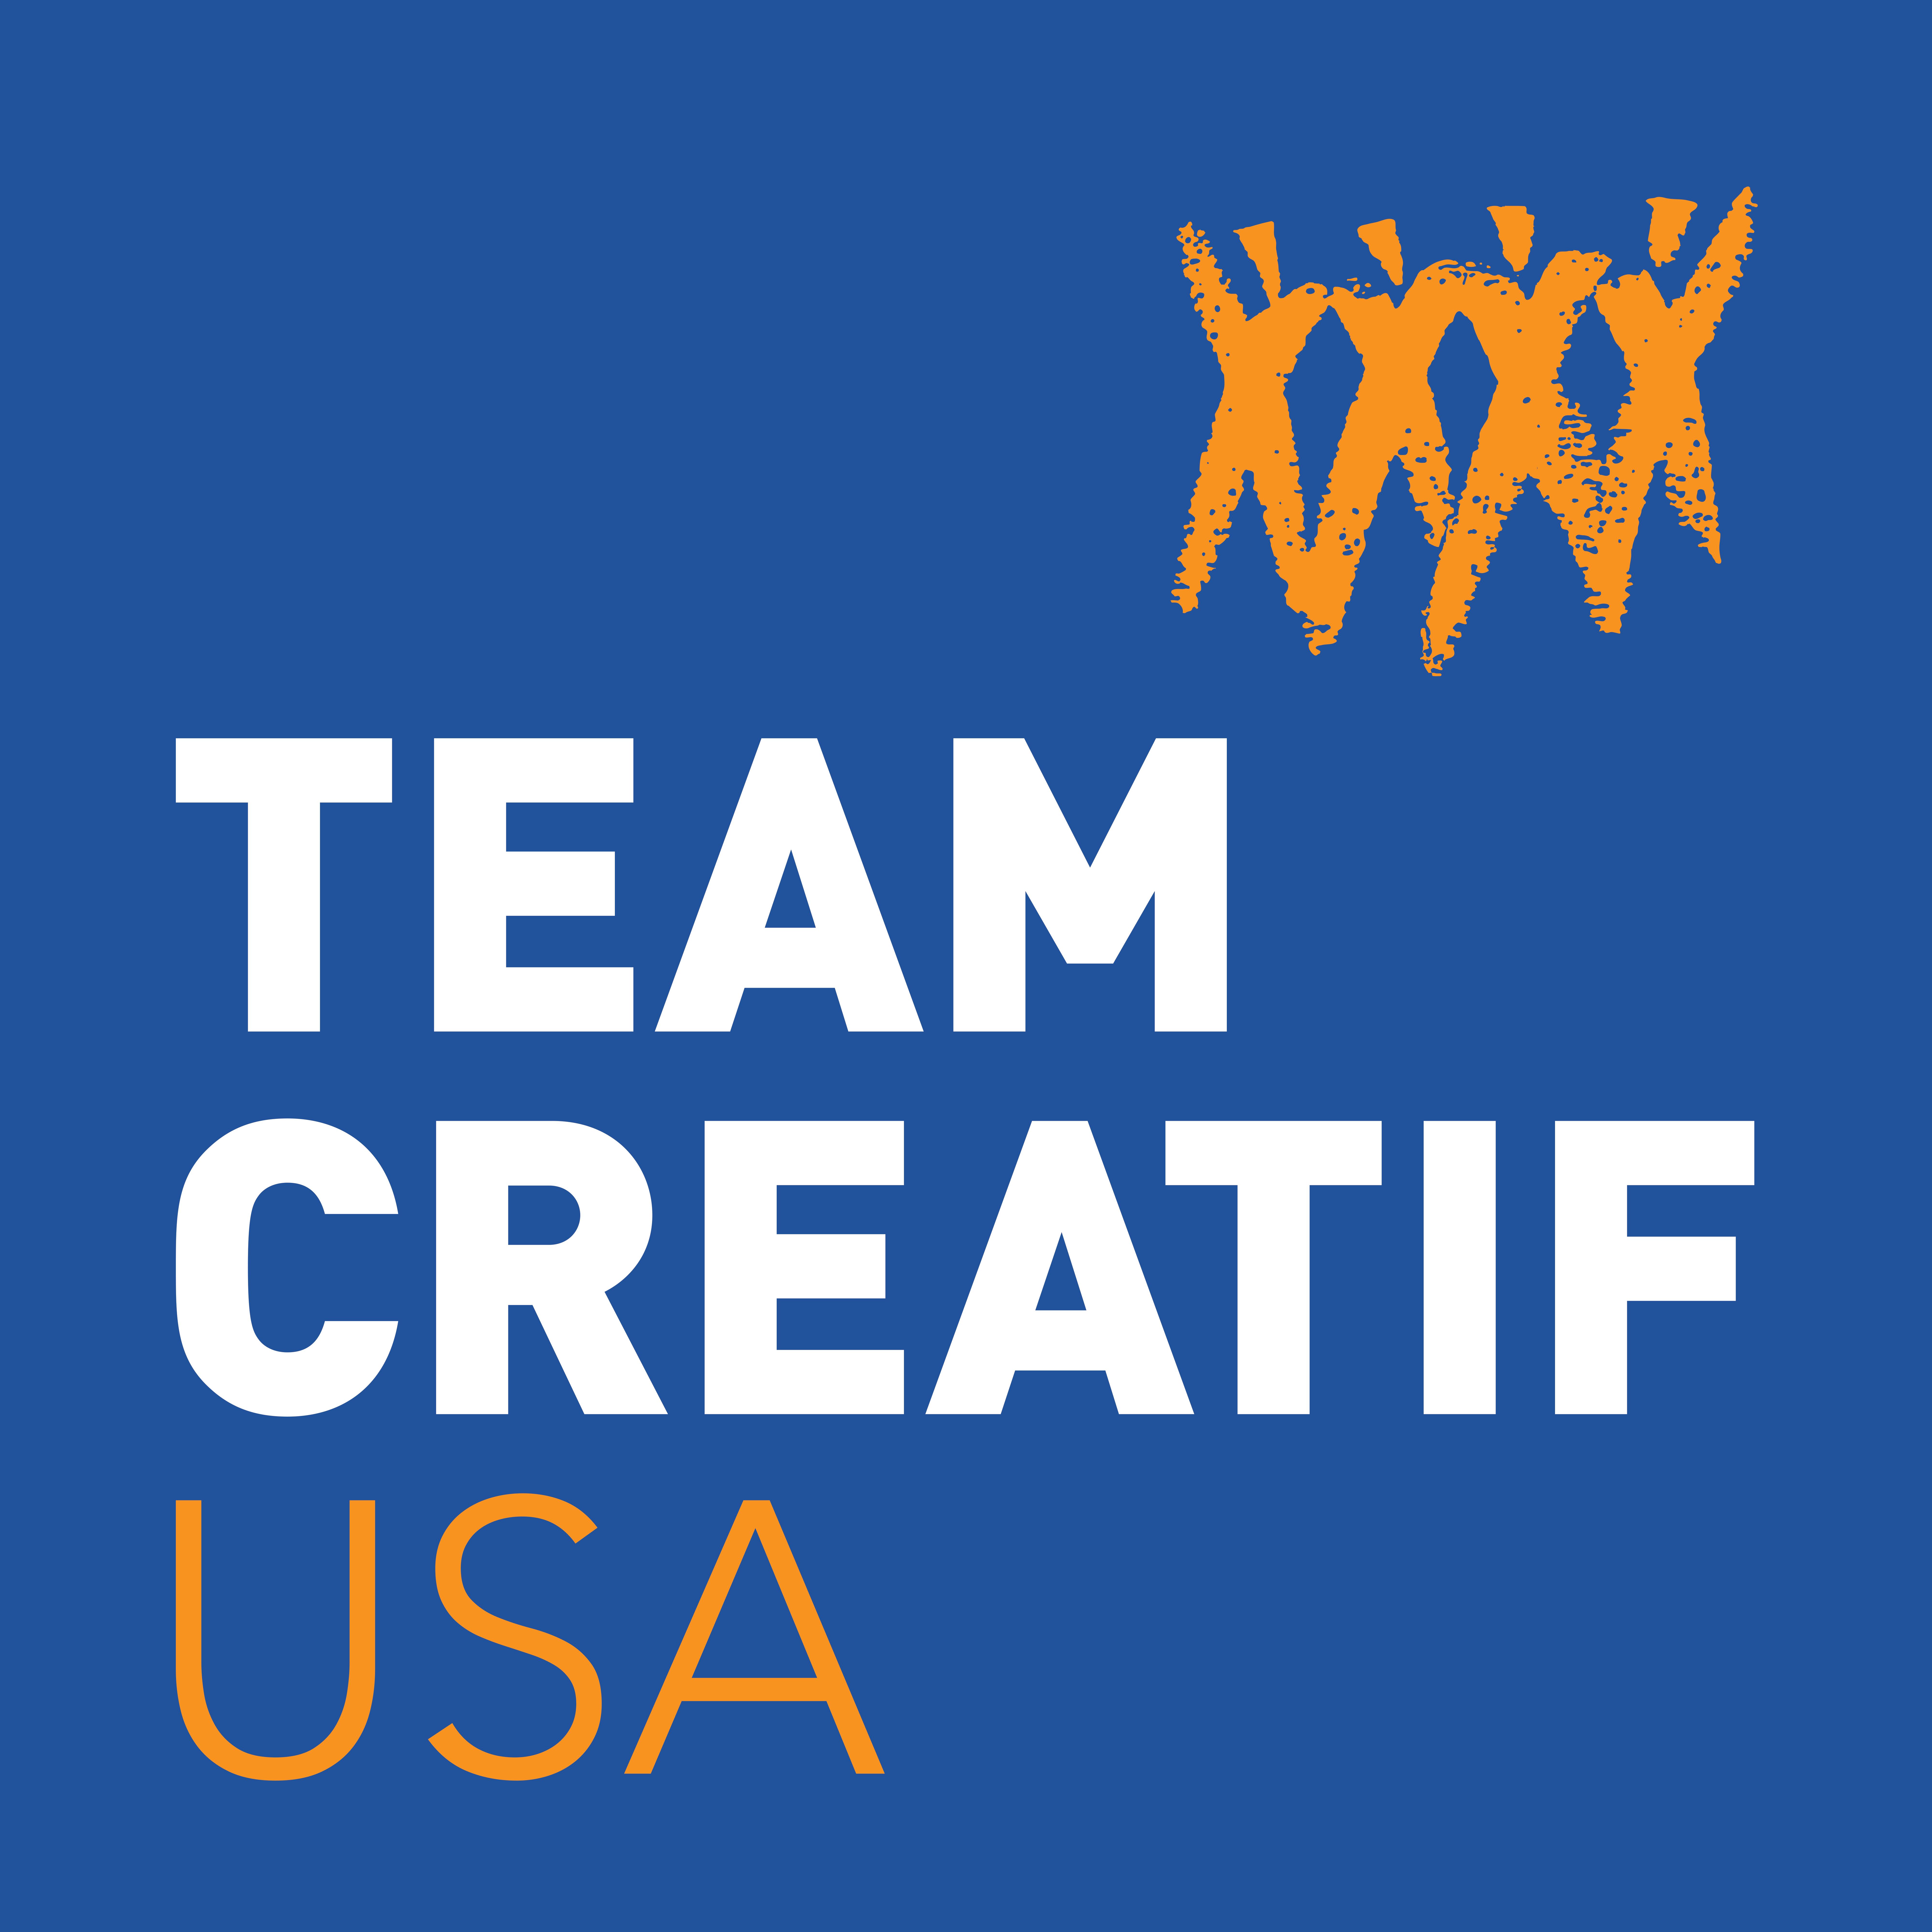 Team Creatif USA